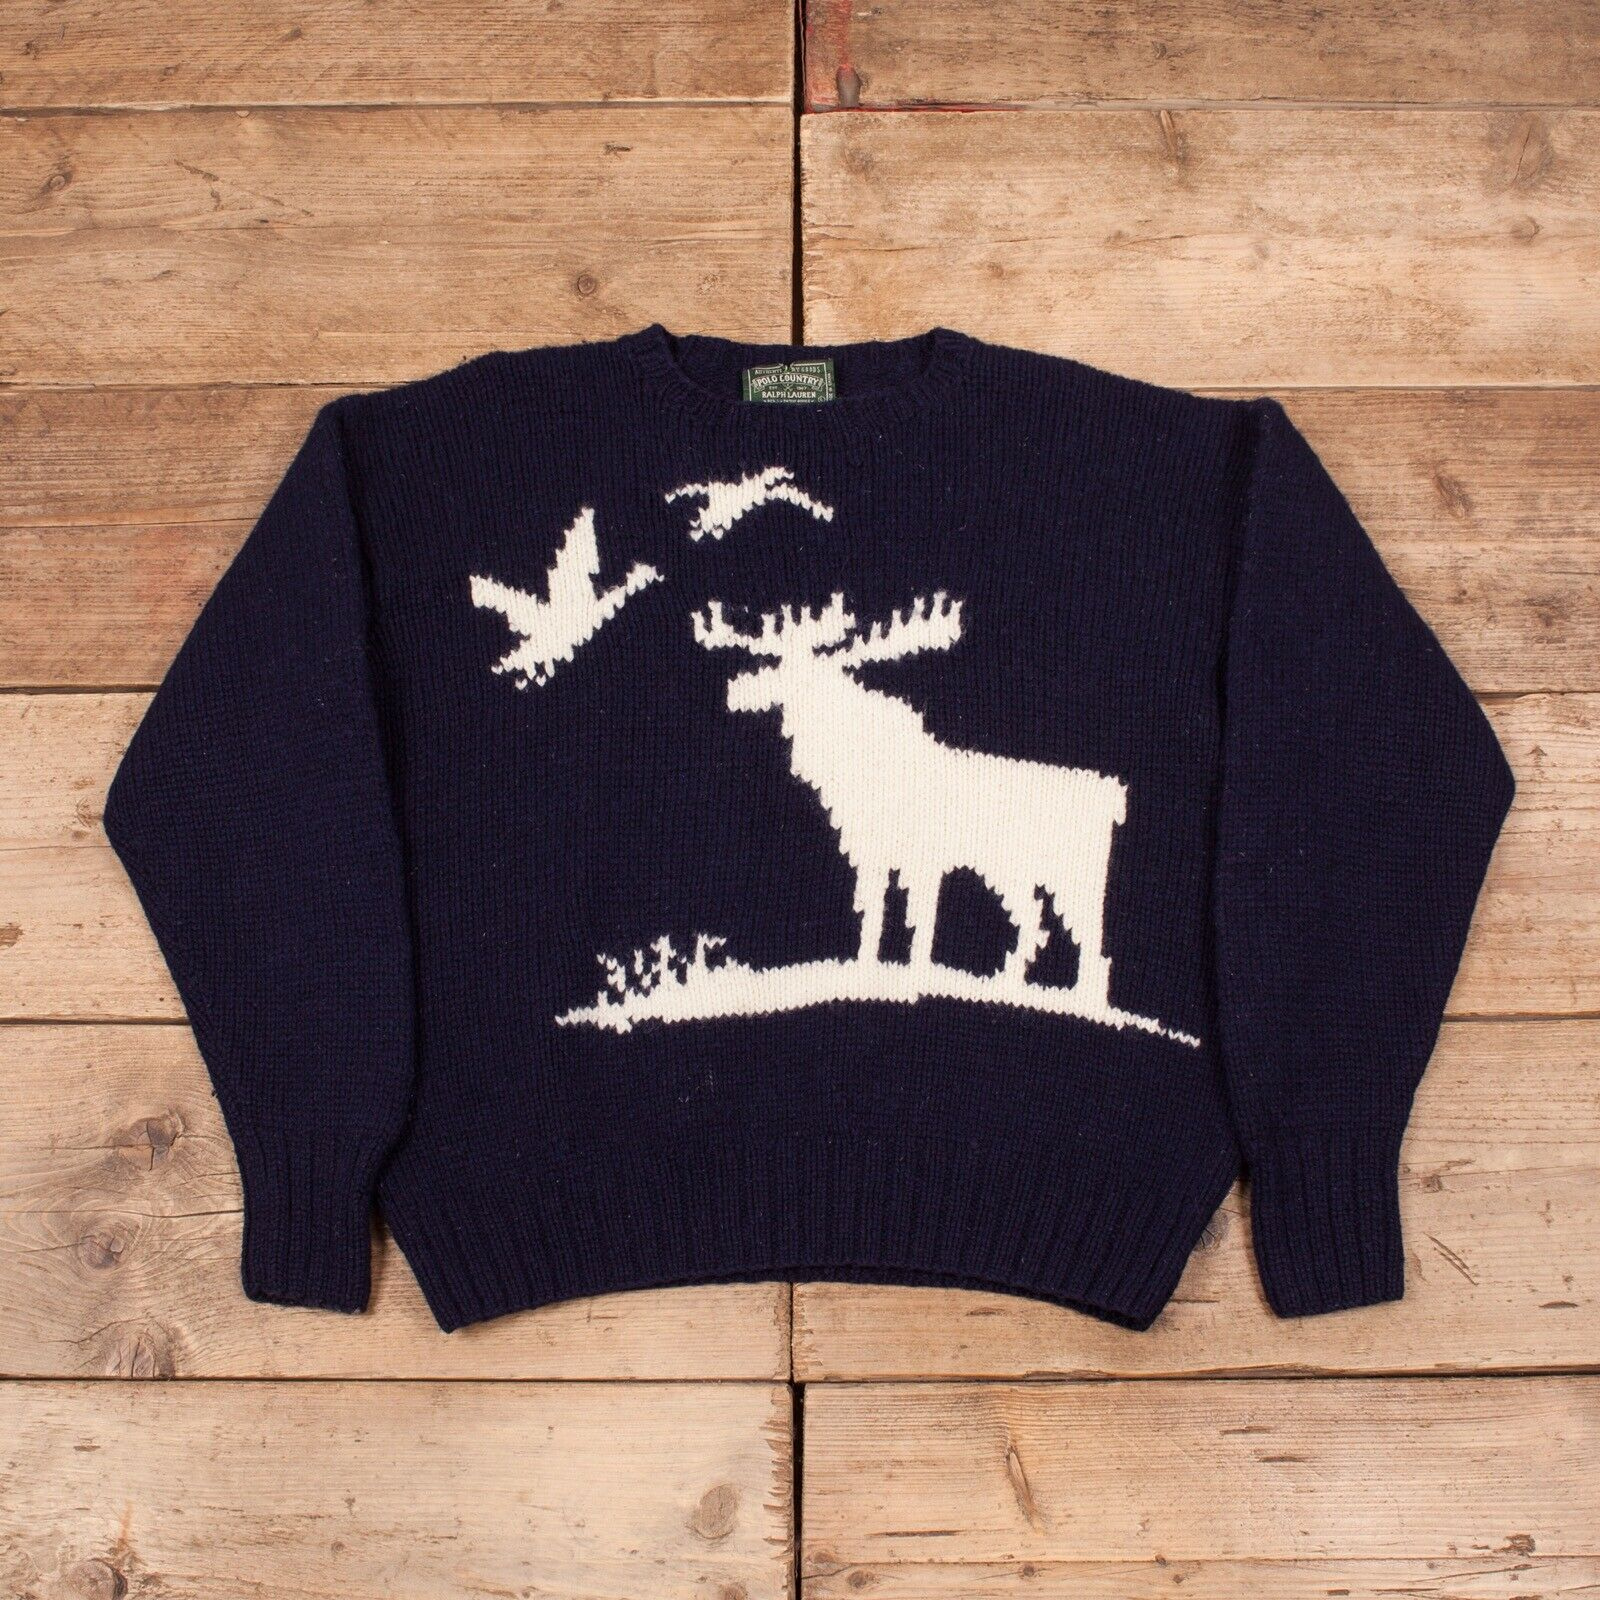 "herren Vintage Polo Country Ralph Lauren 90s Hand Knit Jumper groß 44"" R12058"